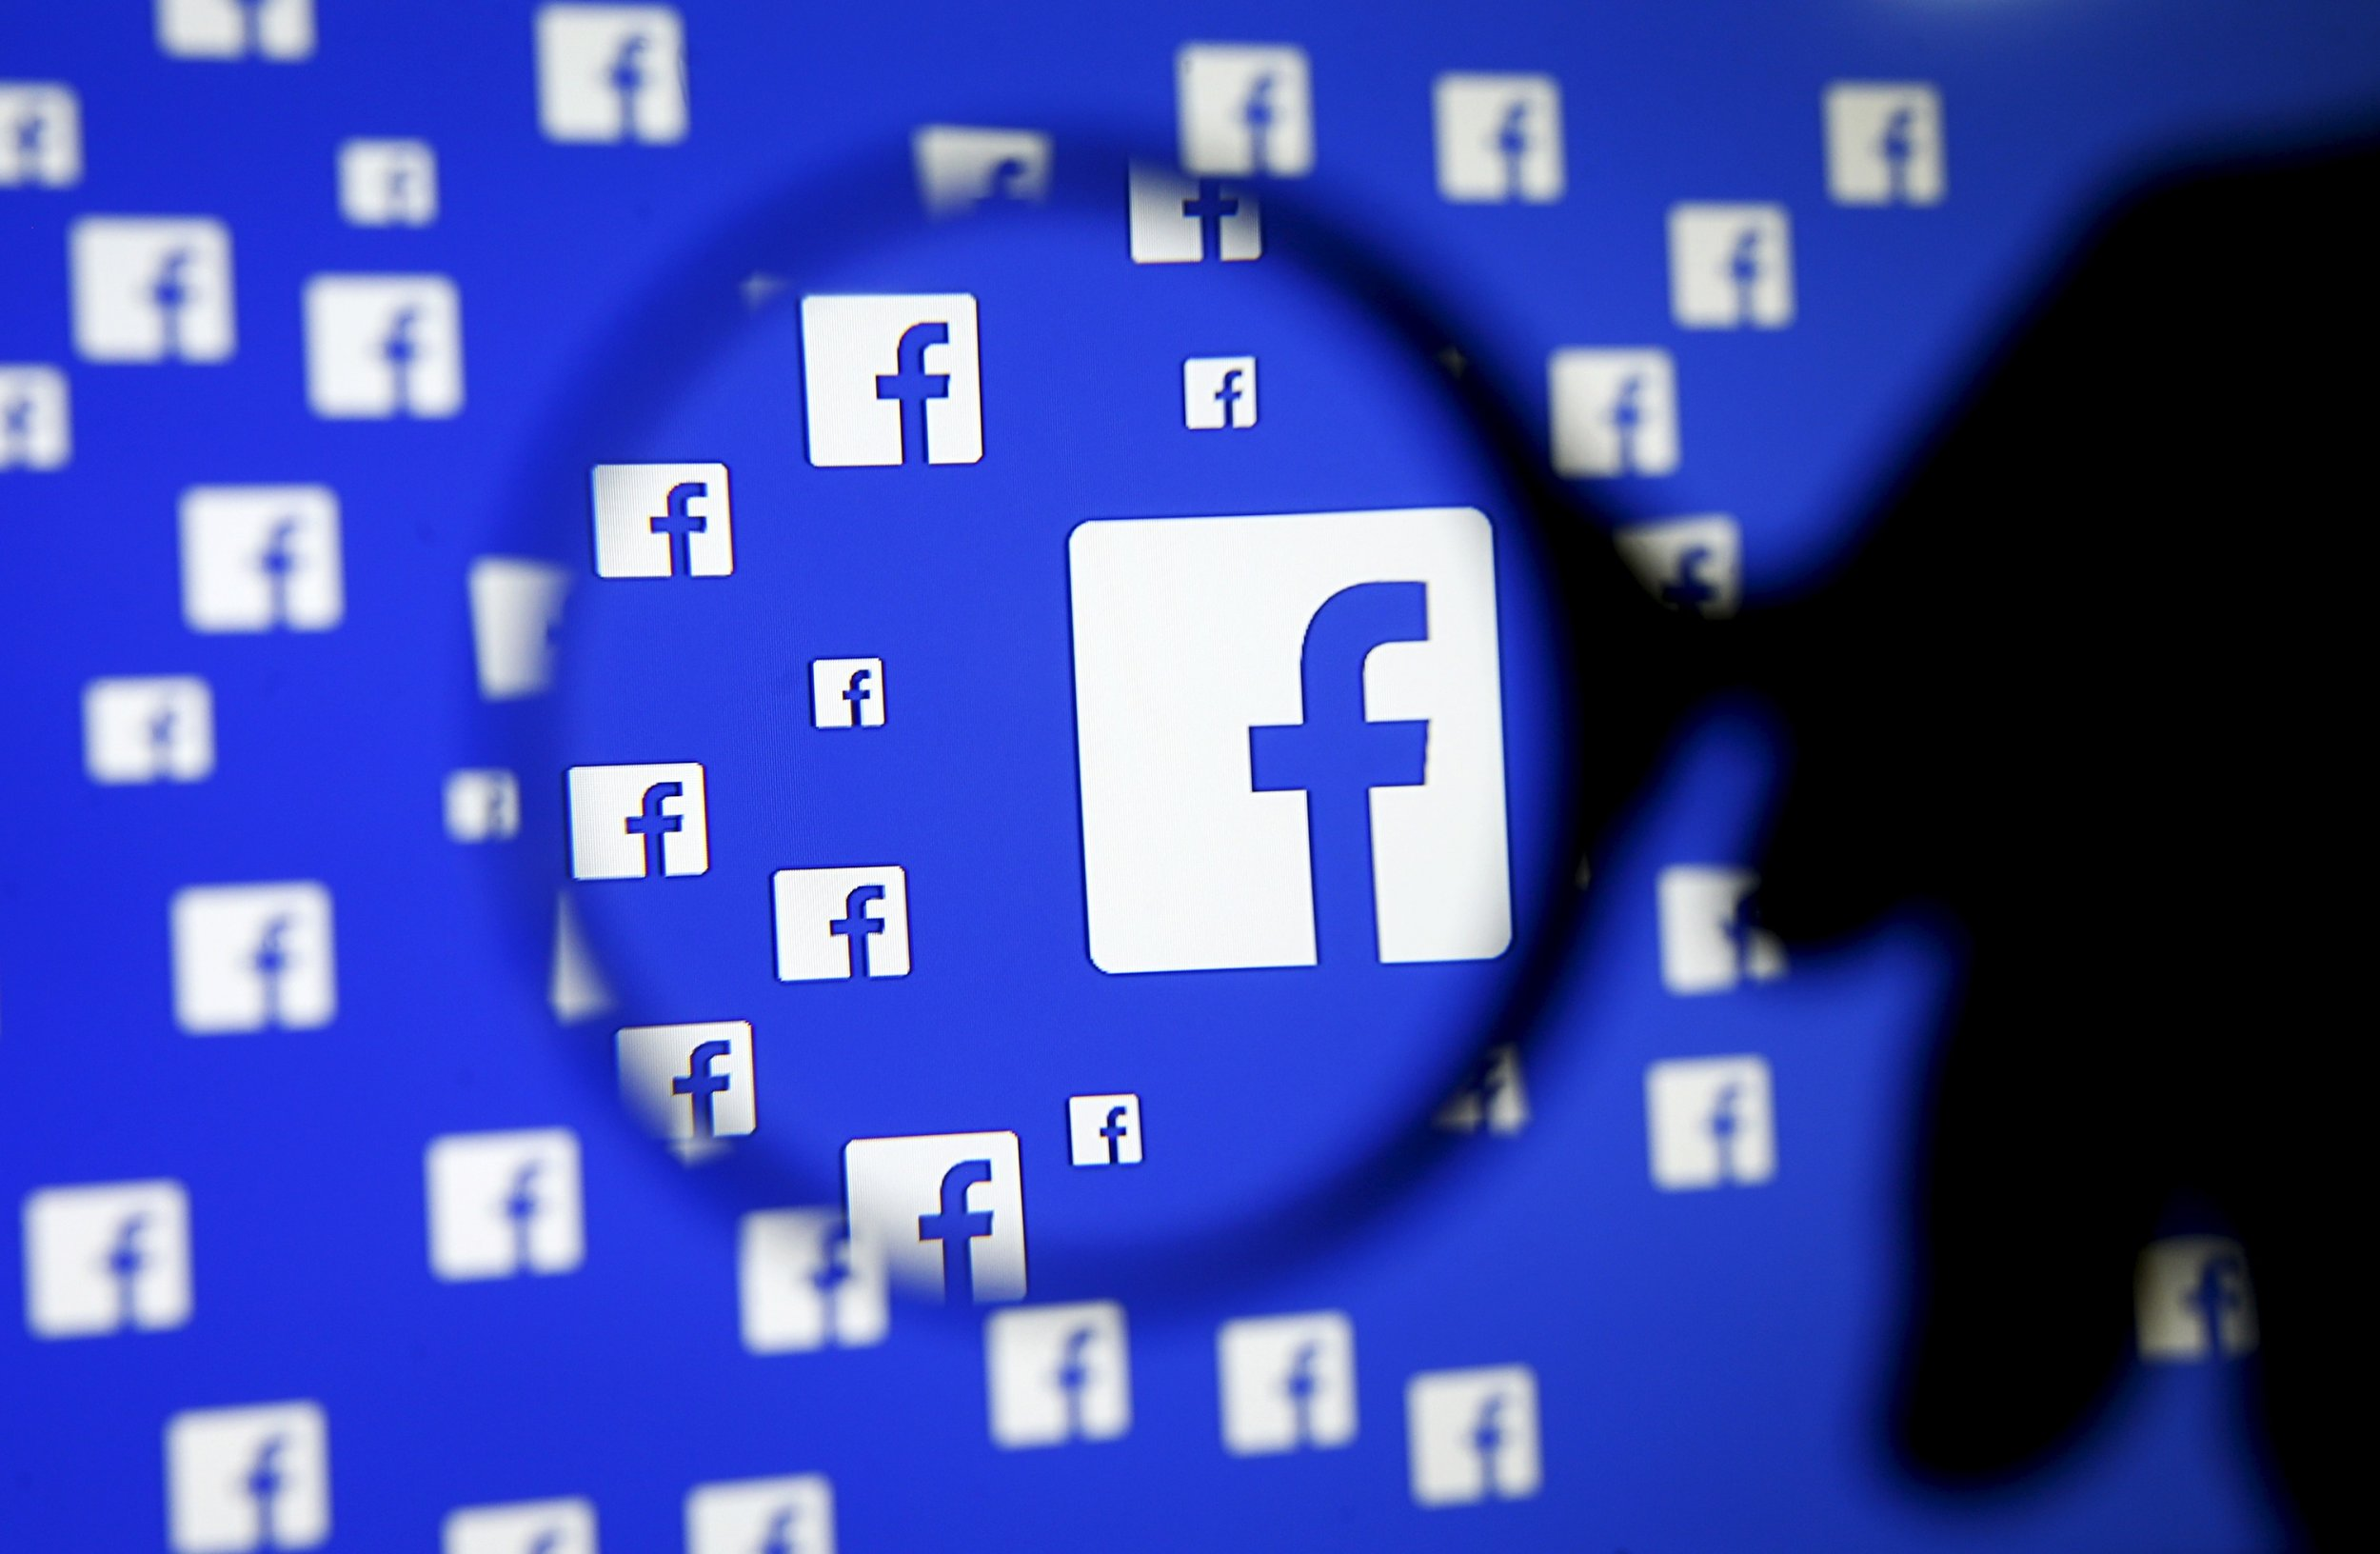 facebook slang linguistics algorithm patent